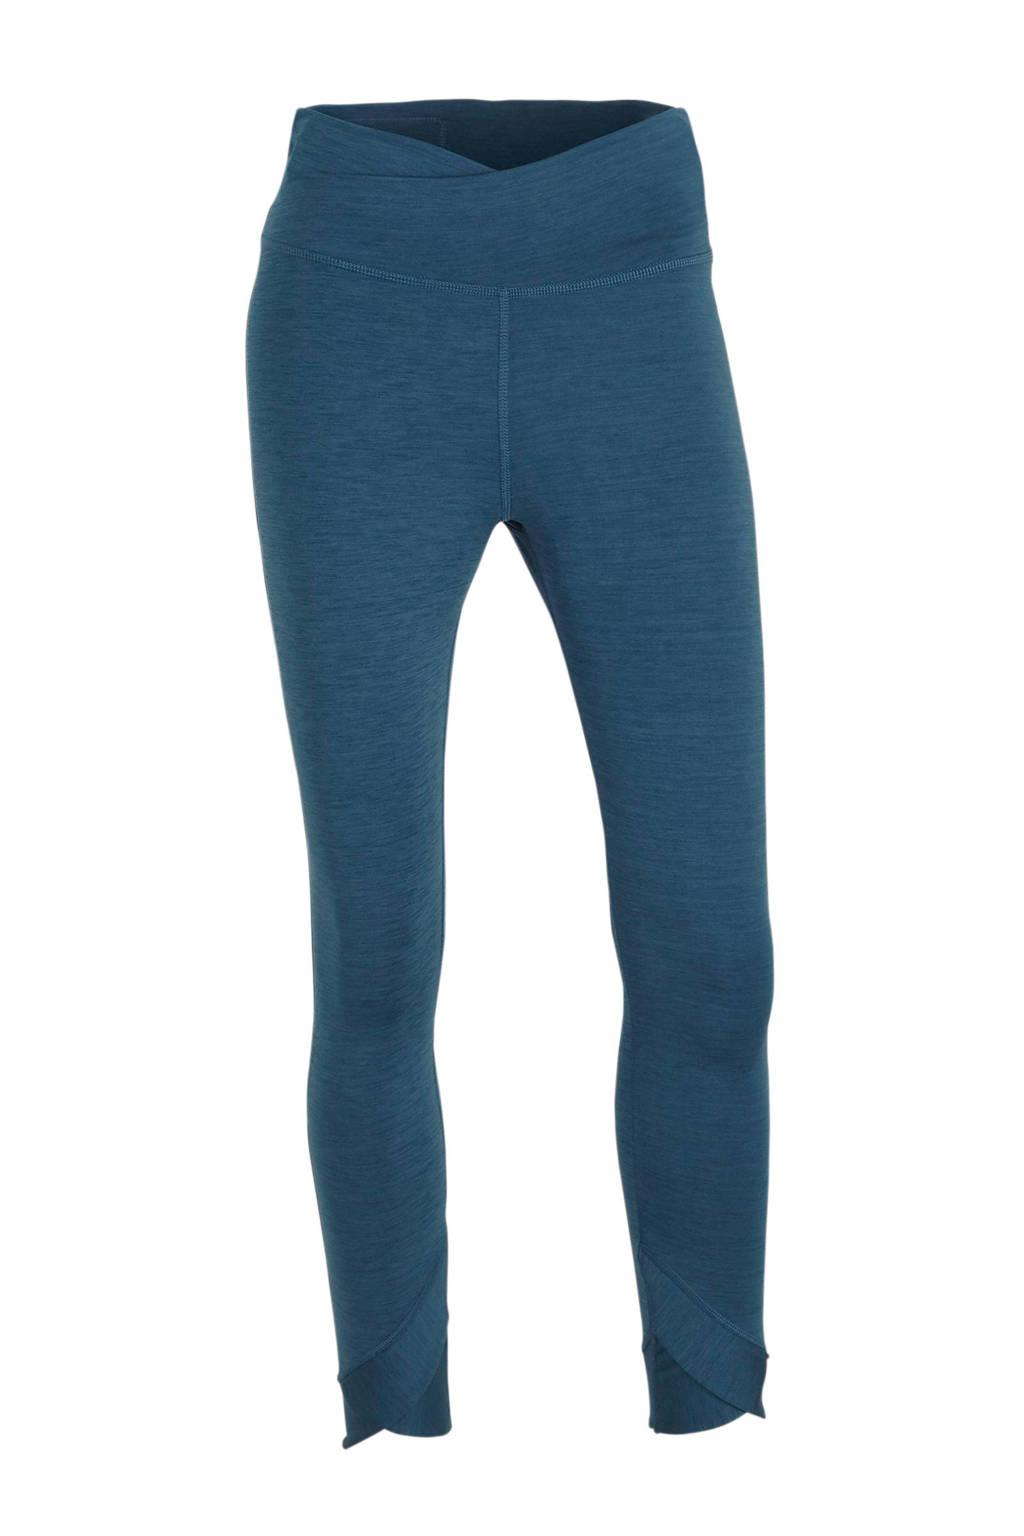 Nike 7/8 sportbroek blauw, Blauw